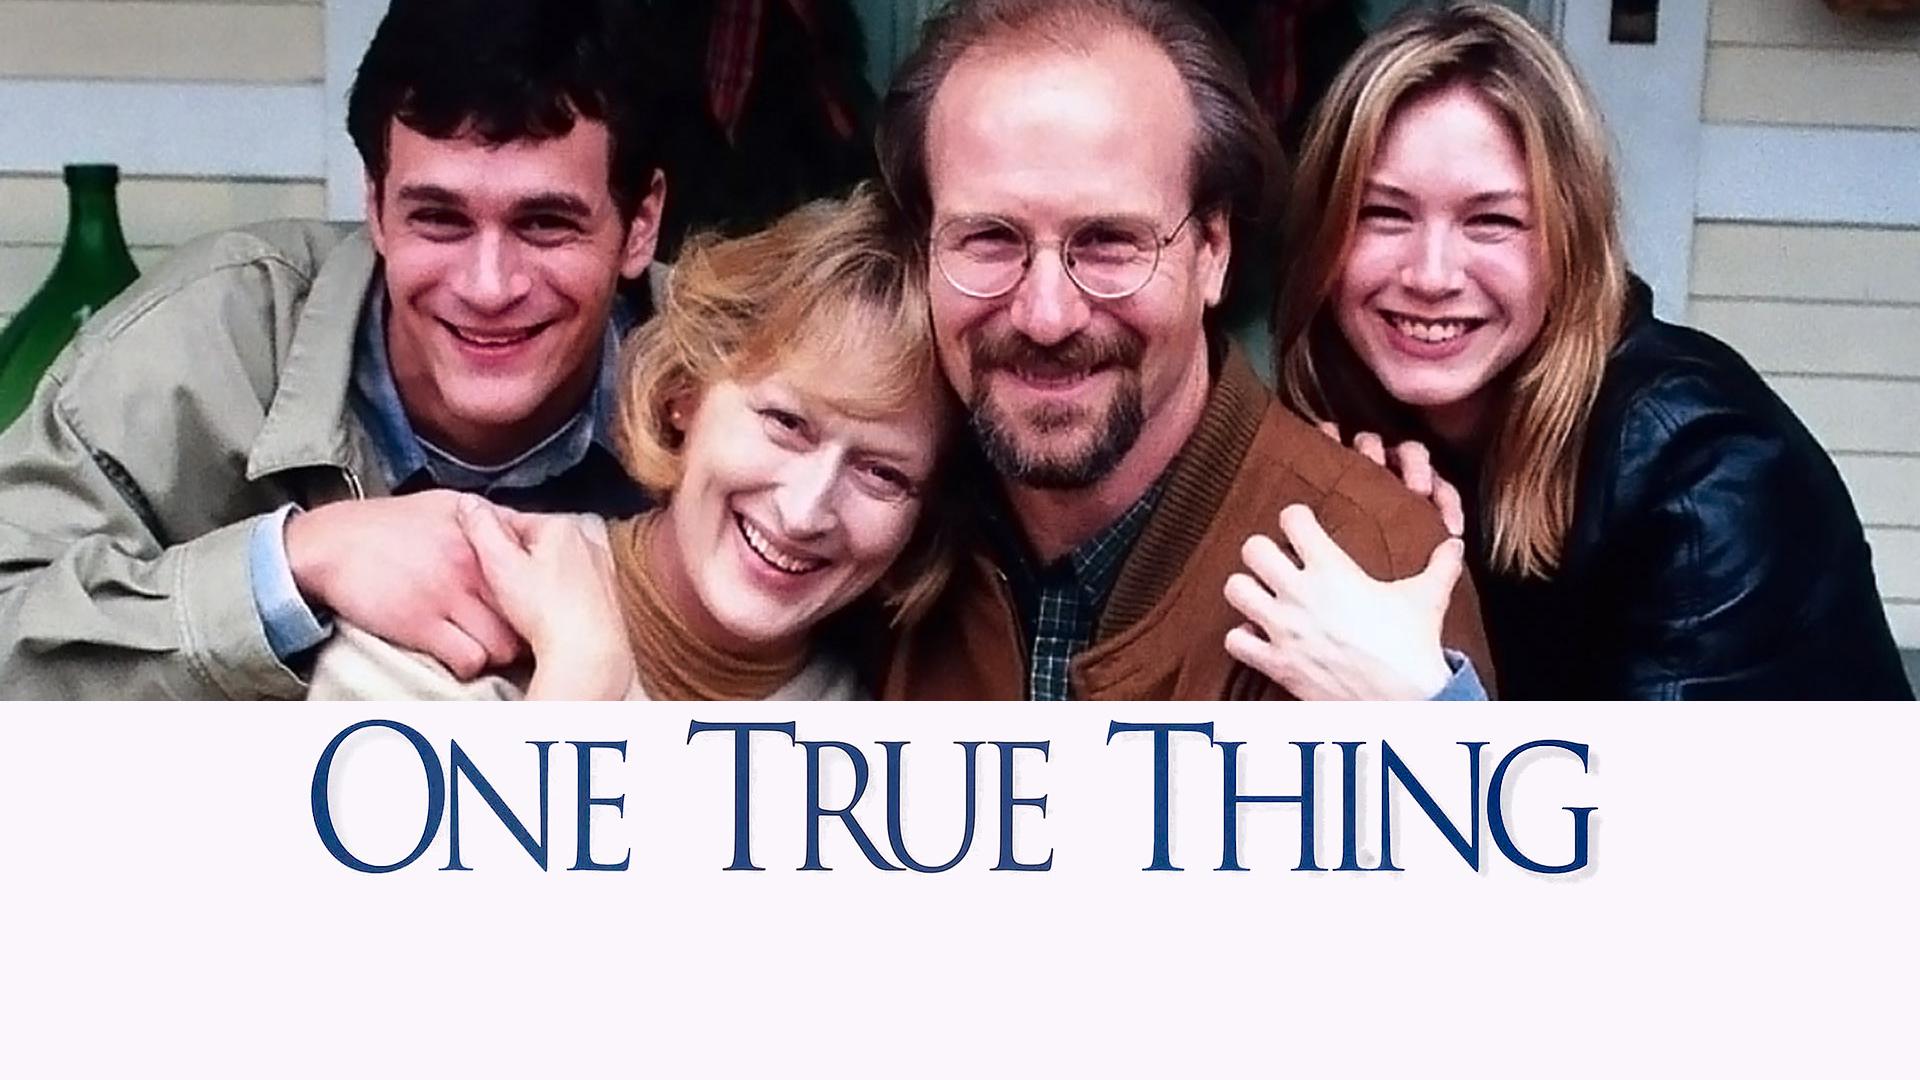 One True Thing